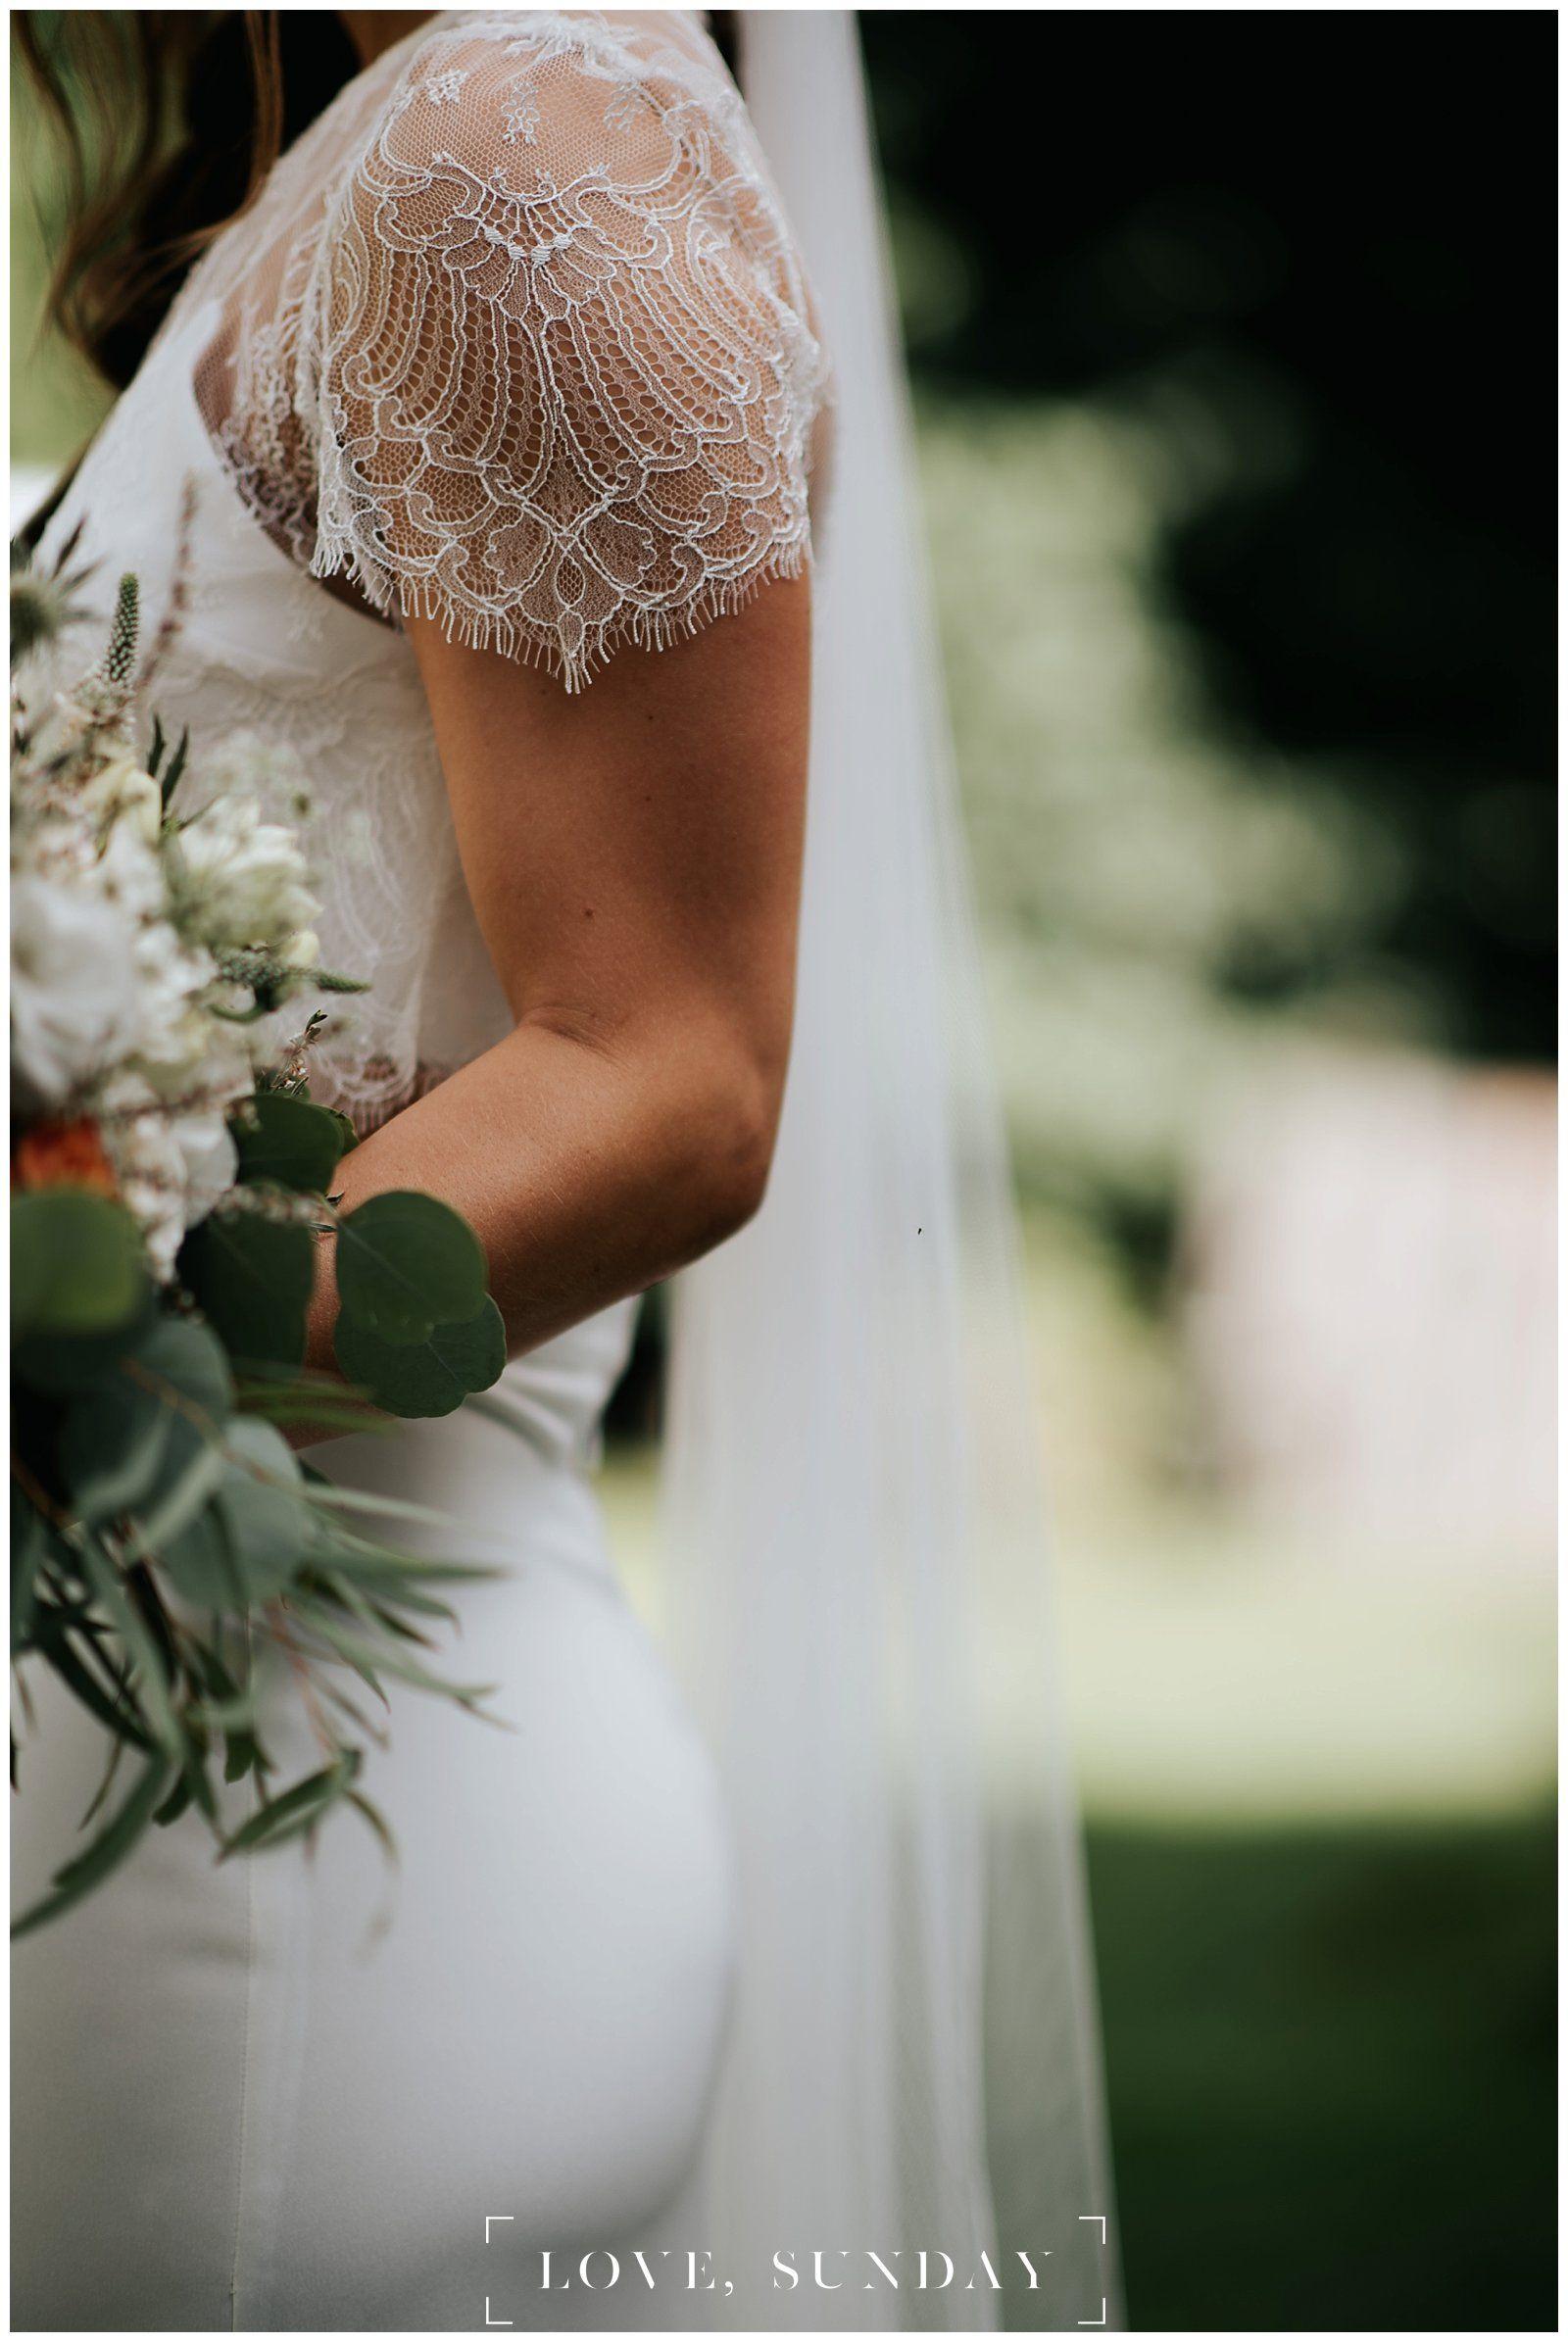 Alexandra grecco wedding dress boho chic bohemian bride two piece